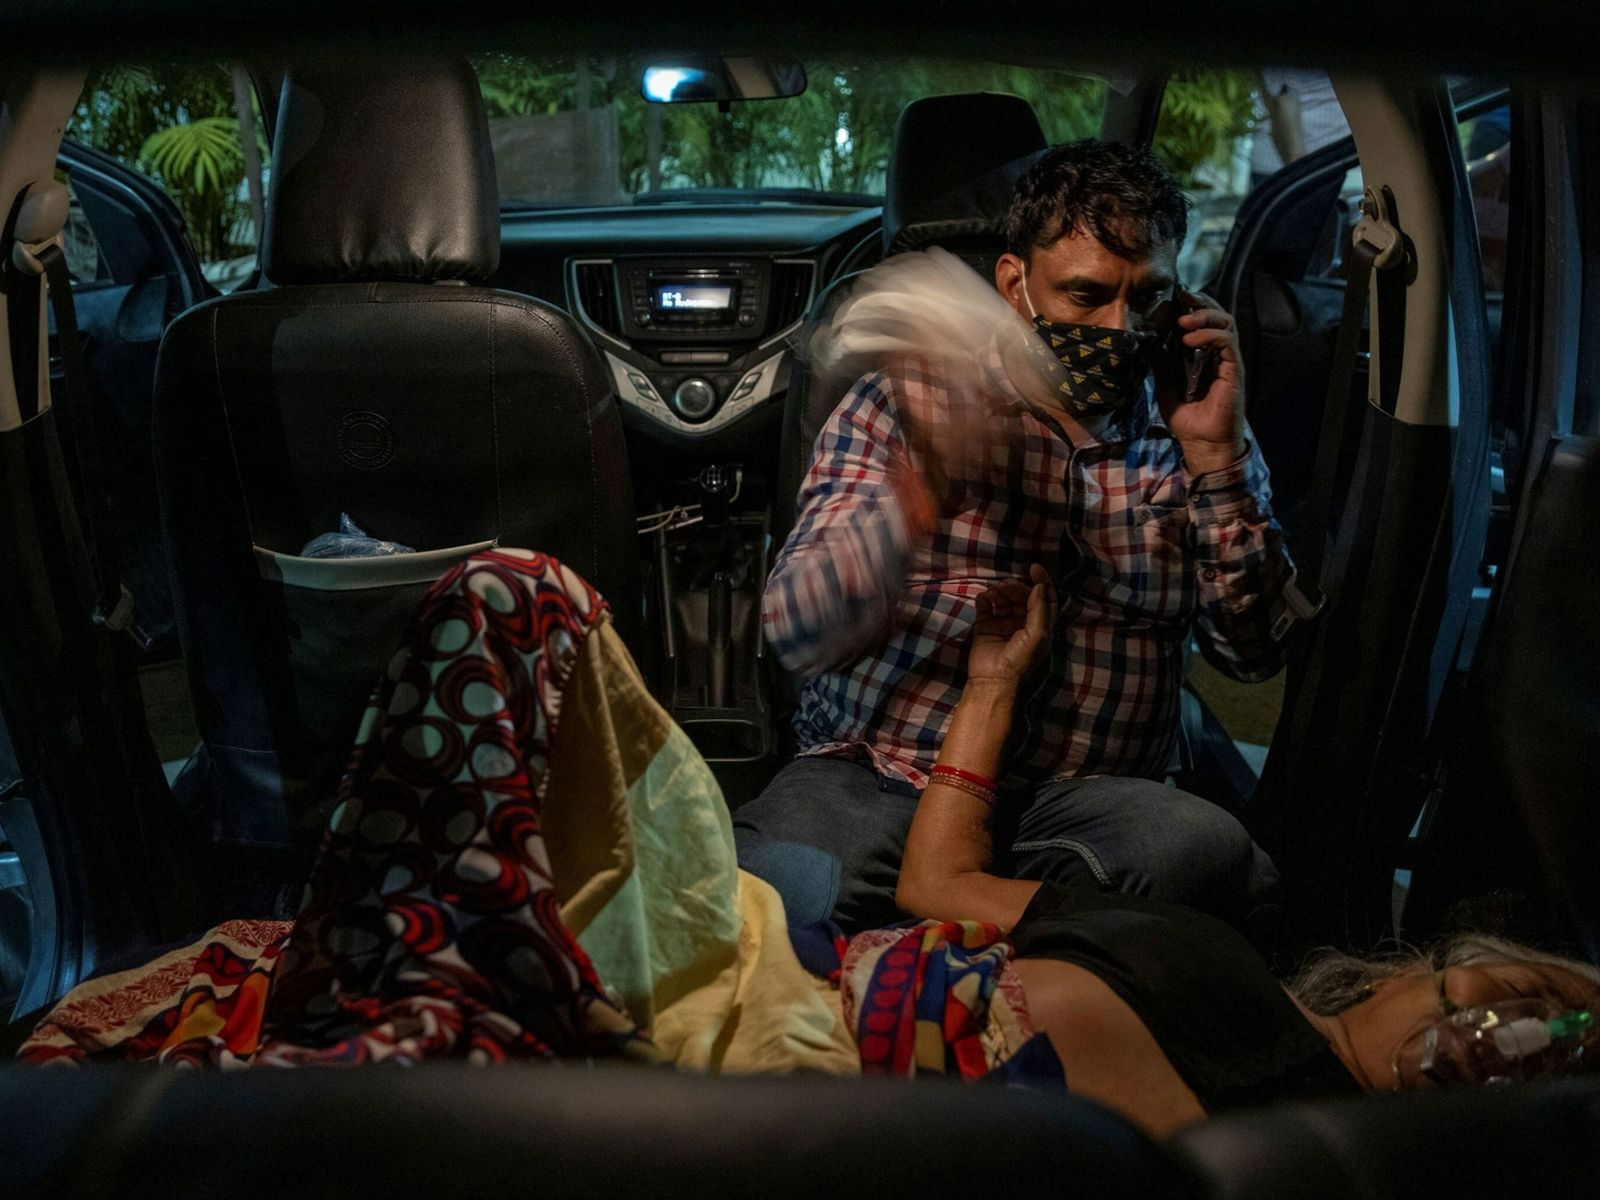 Manoj Kumar se sienta junto a su madre